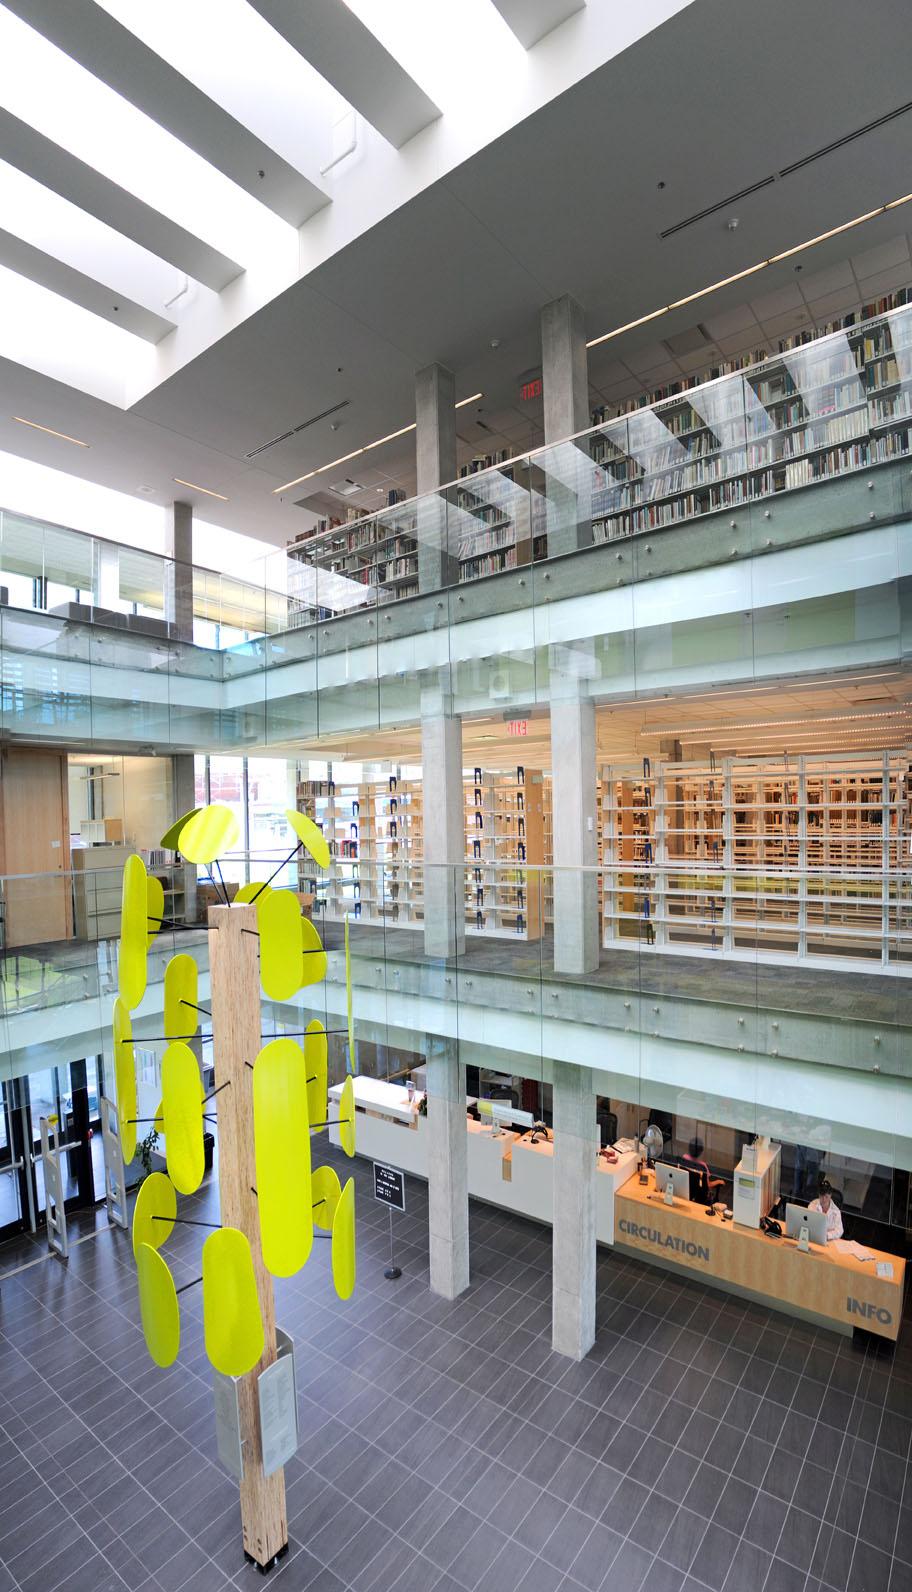 Harris-Learning-Library-Lobby.jpg